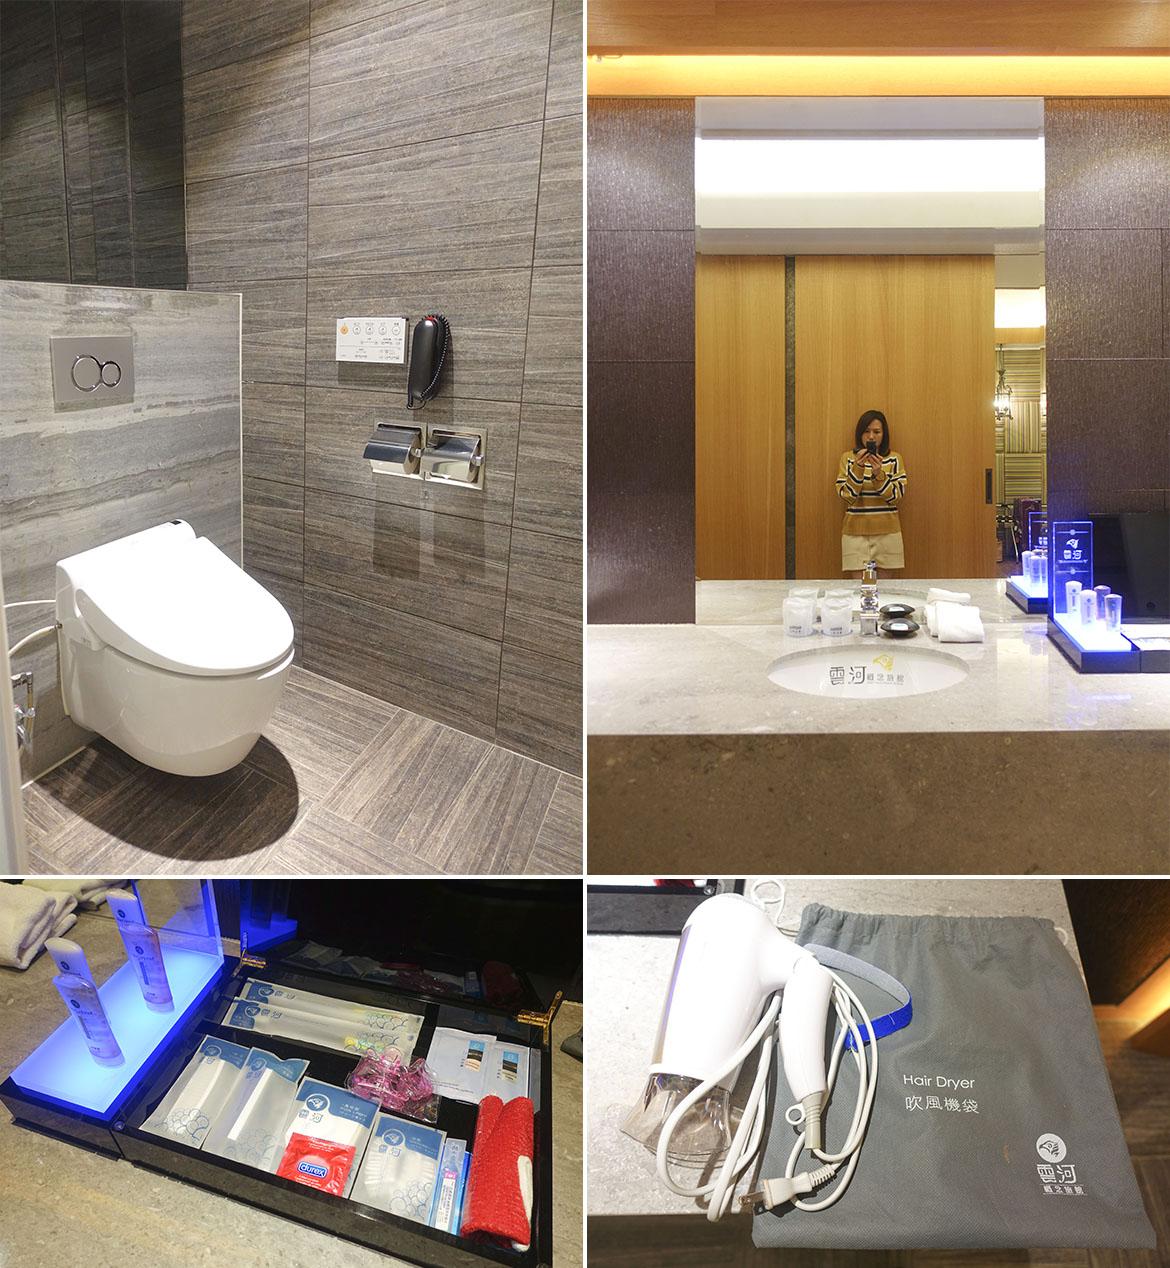 雲河概念旅館 Uher luxury resort hotel